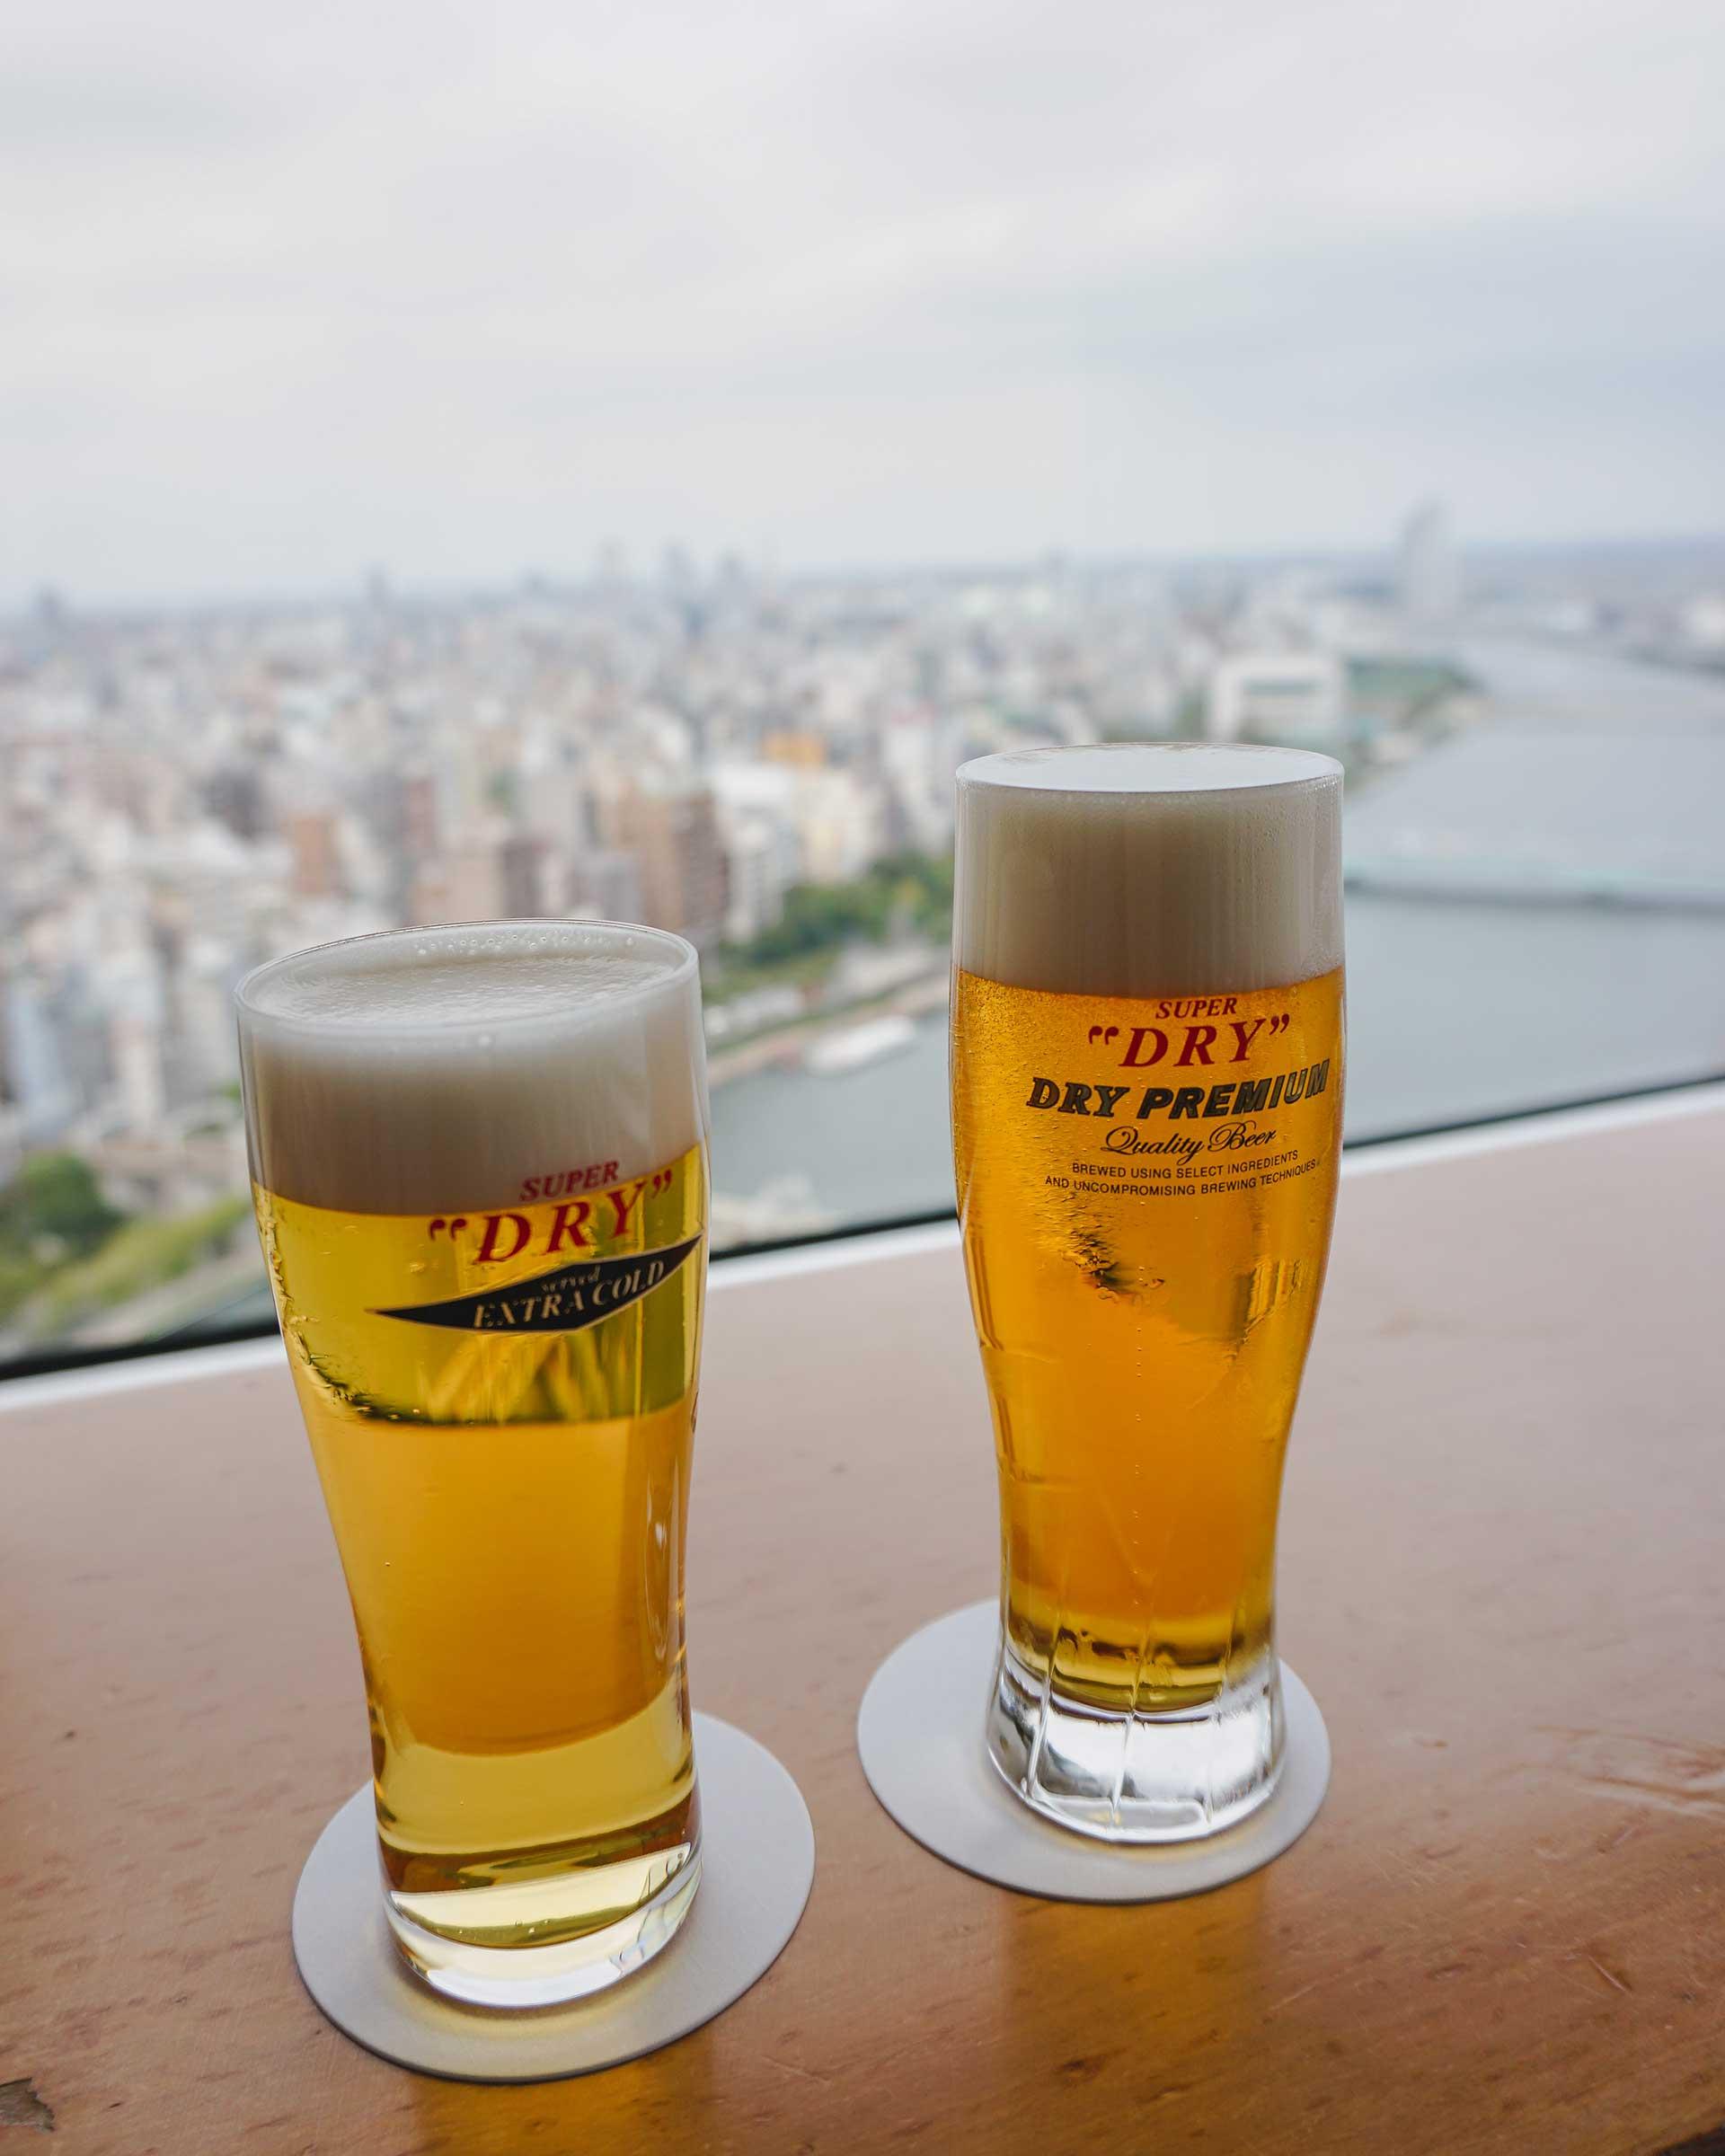 Two glasses of Asahi beer